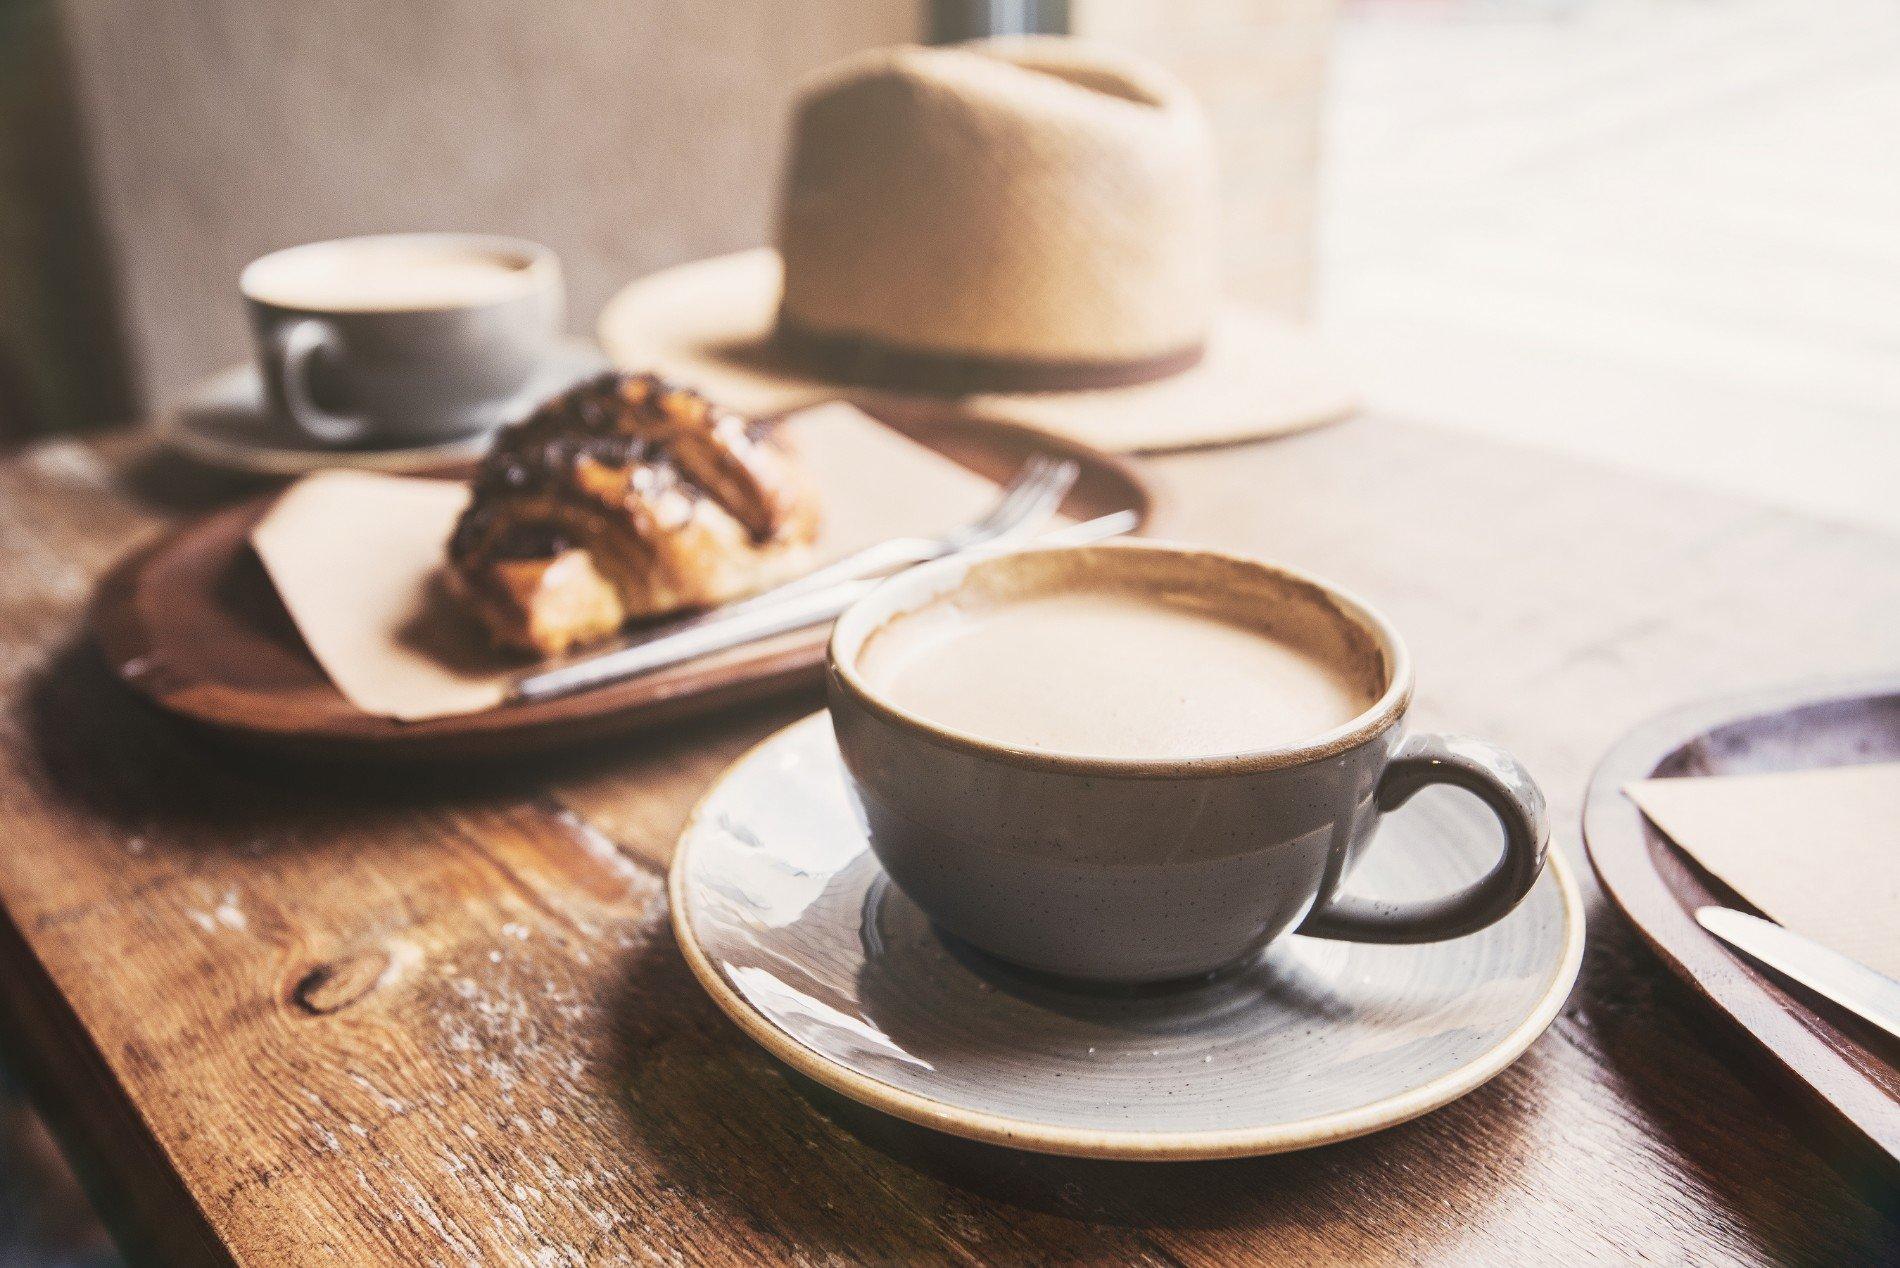 gastronomia-caffeina-ospedaletto-pisa-002